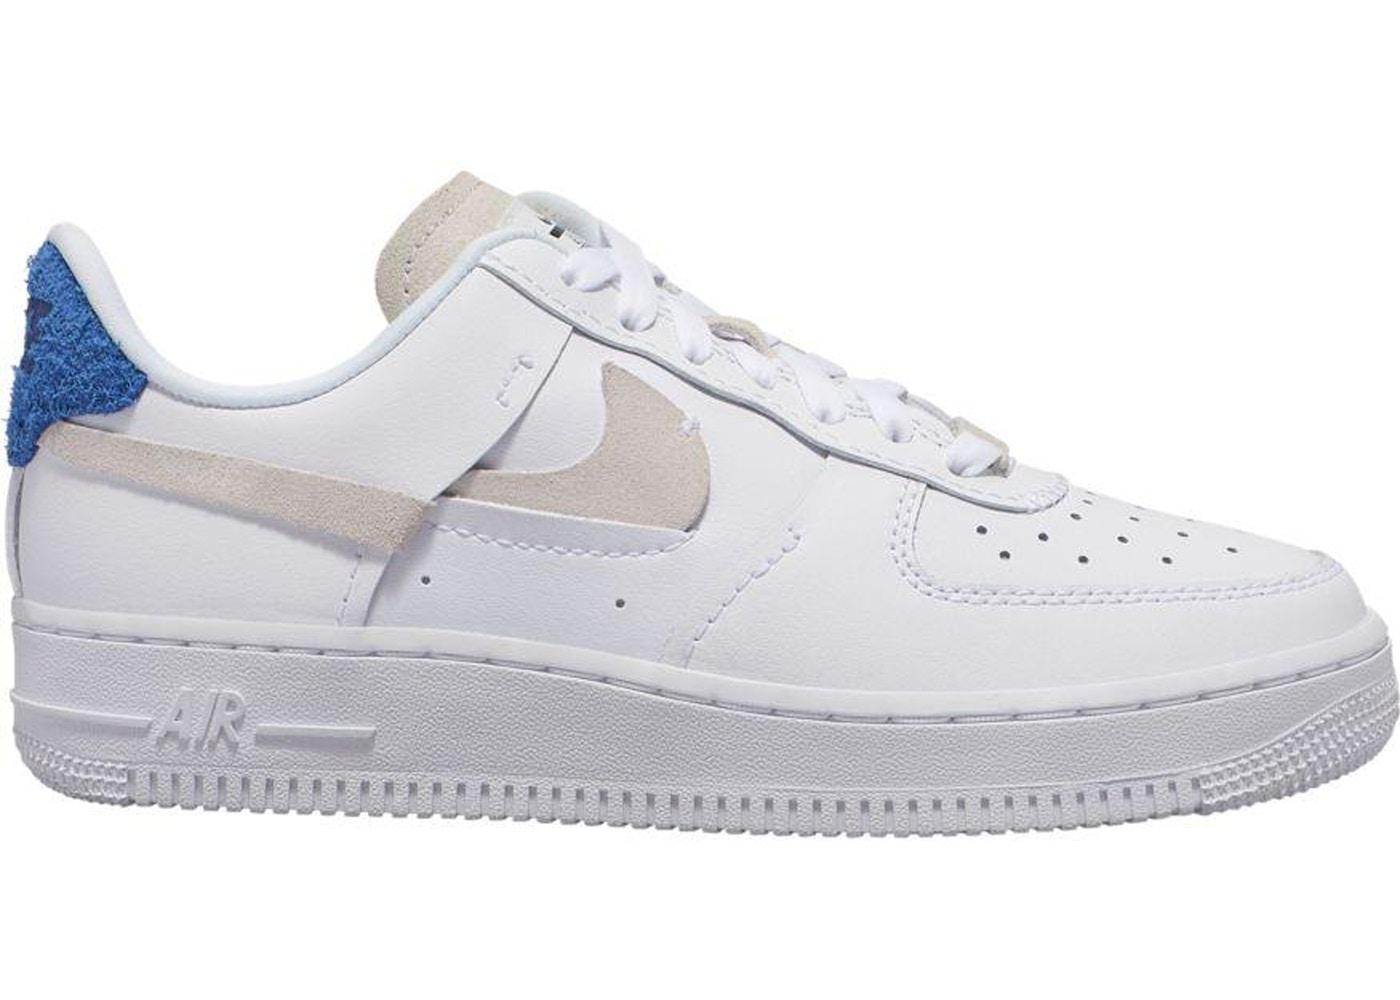 Shoesamp; Force Sneakers 1 Buy Deadstock Nike Air hQdtCsrx